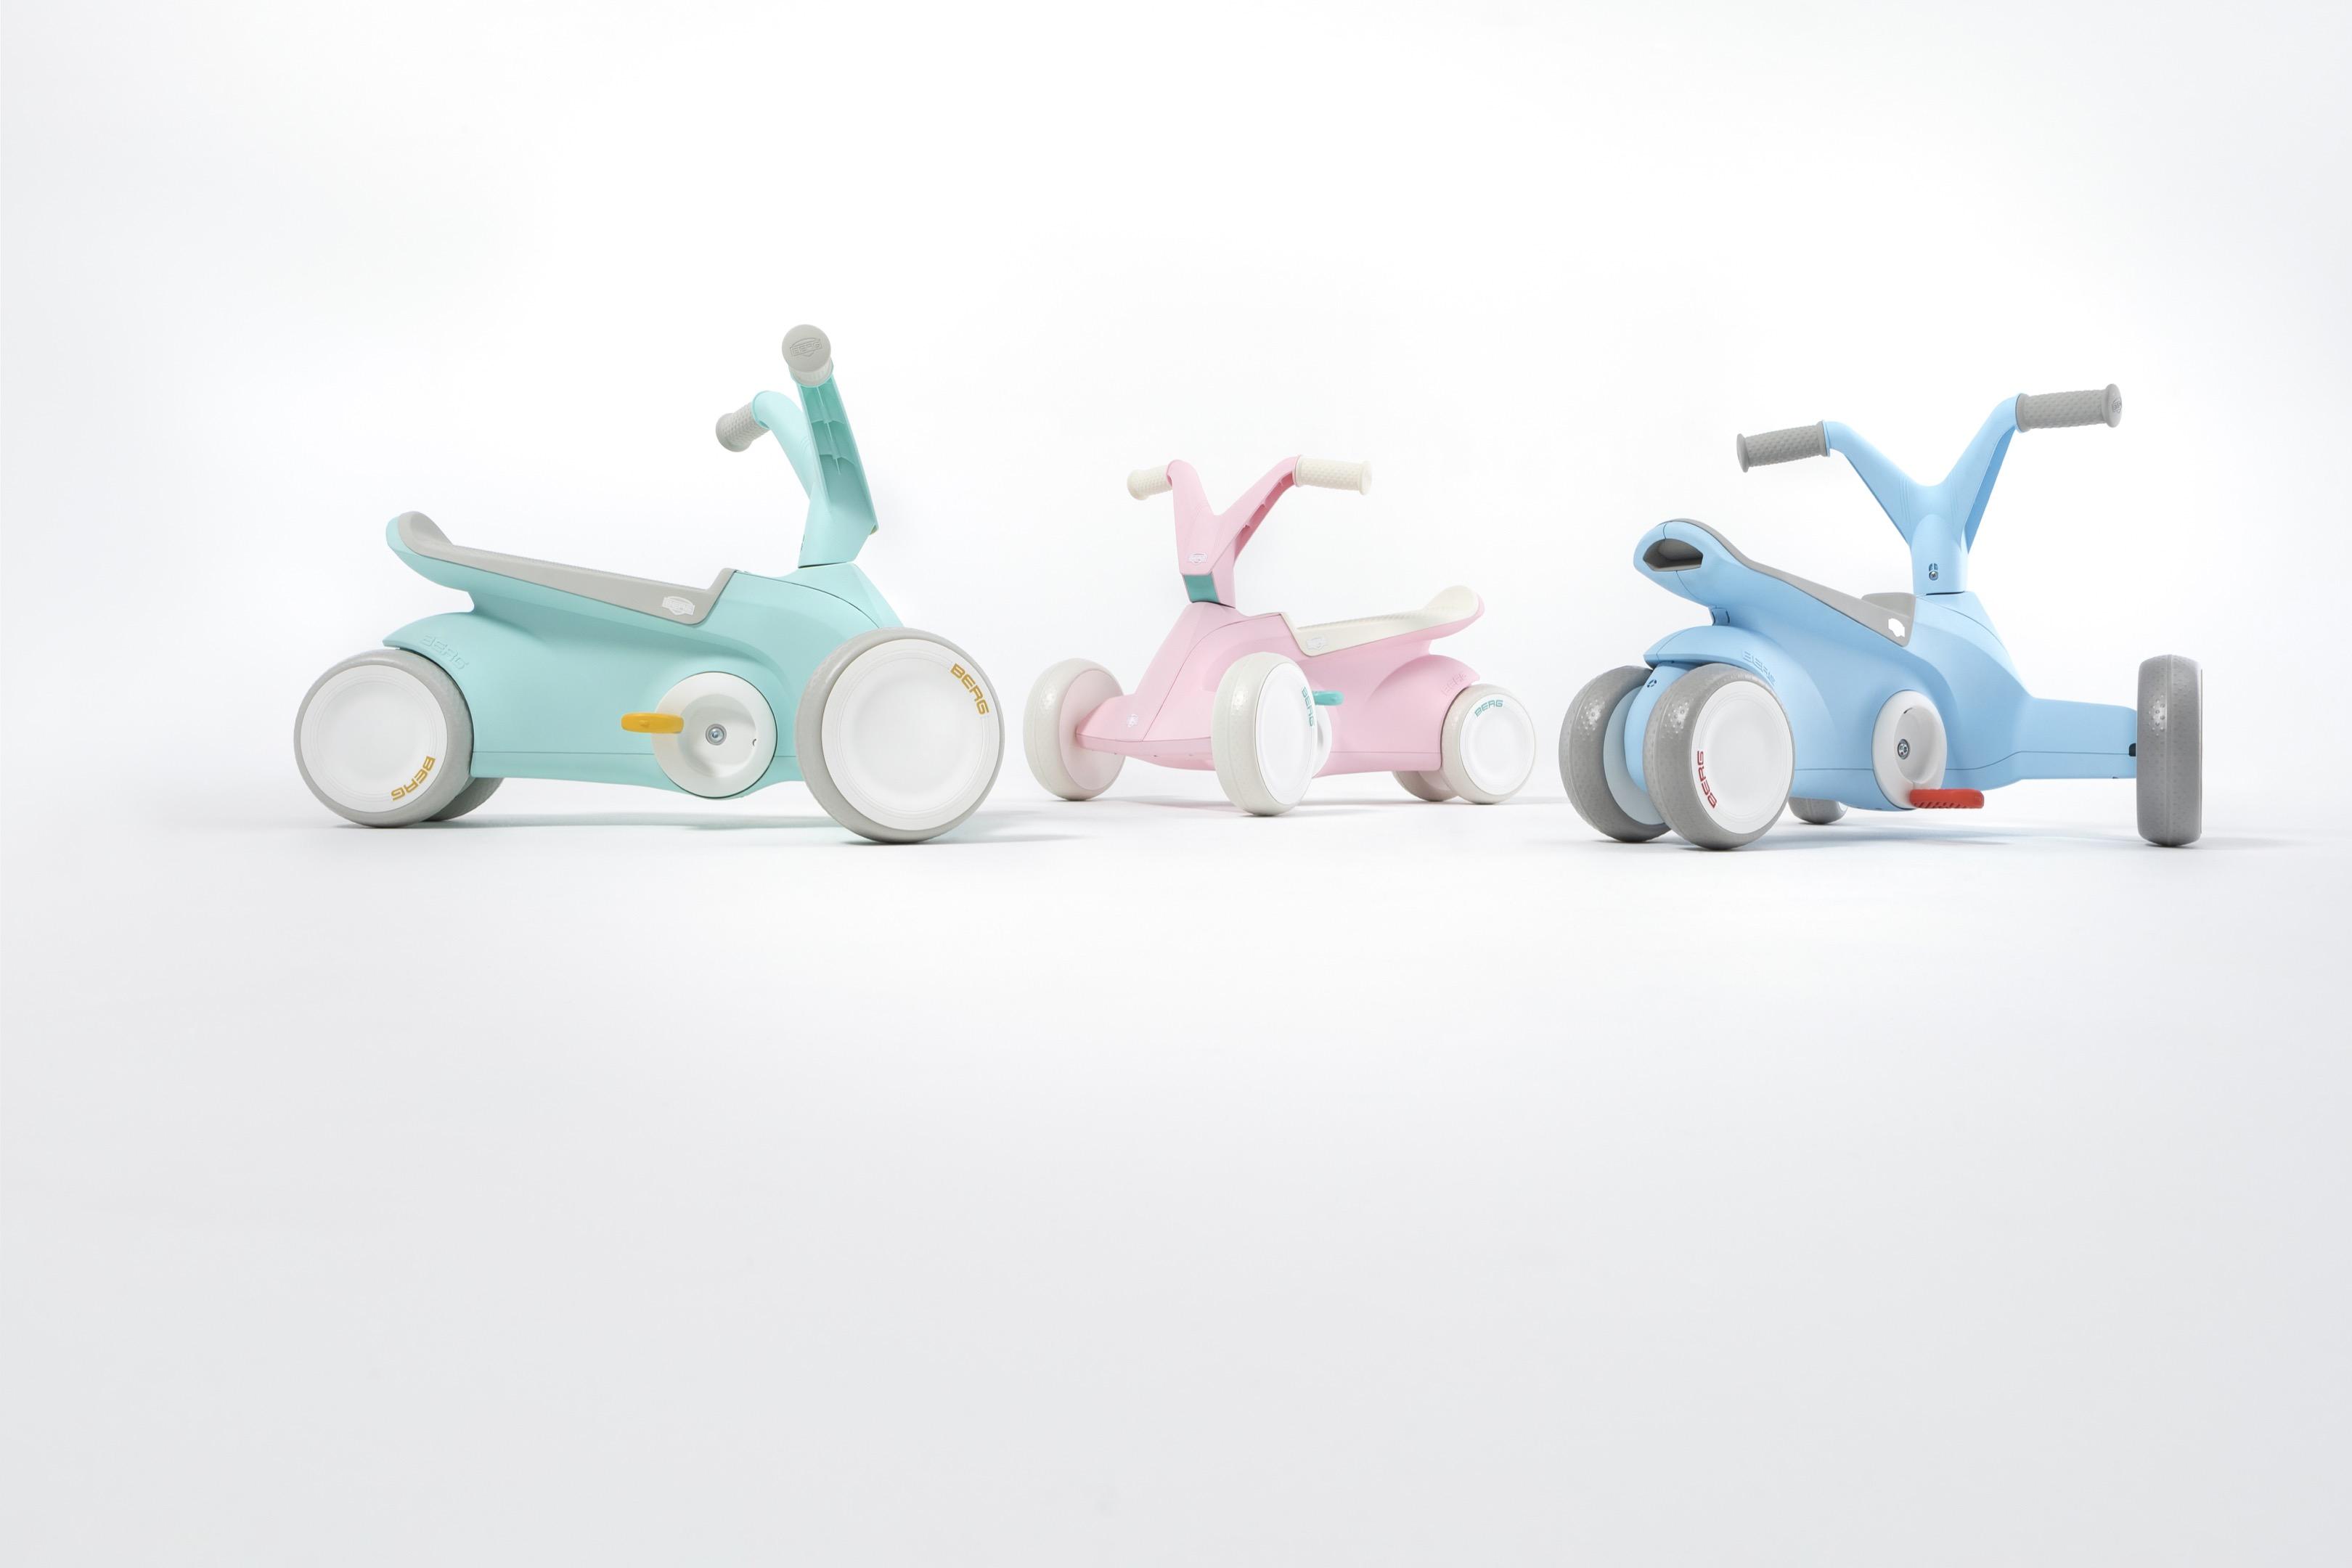 Jurjen Poeles fotografie Berg Toys lifestyle go2 pedal cart pedalcart skelter kinder speelgoed kind interieur productfotografie product locatie studio